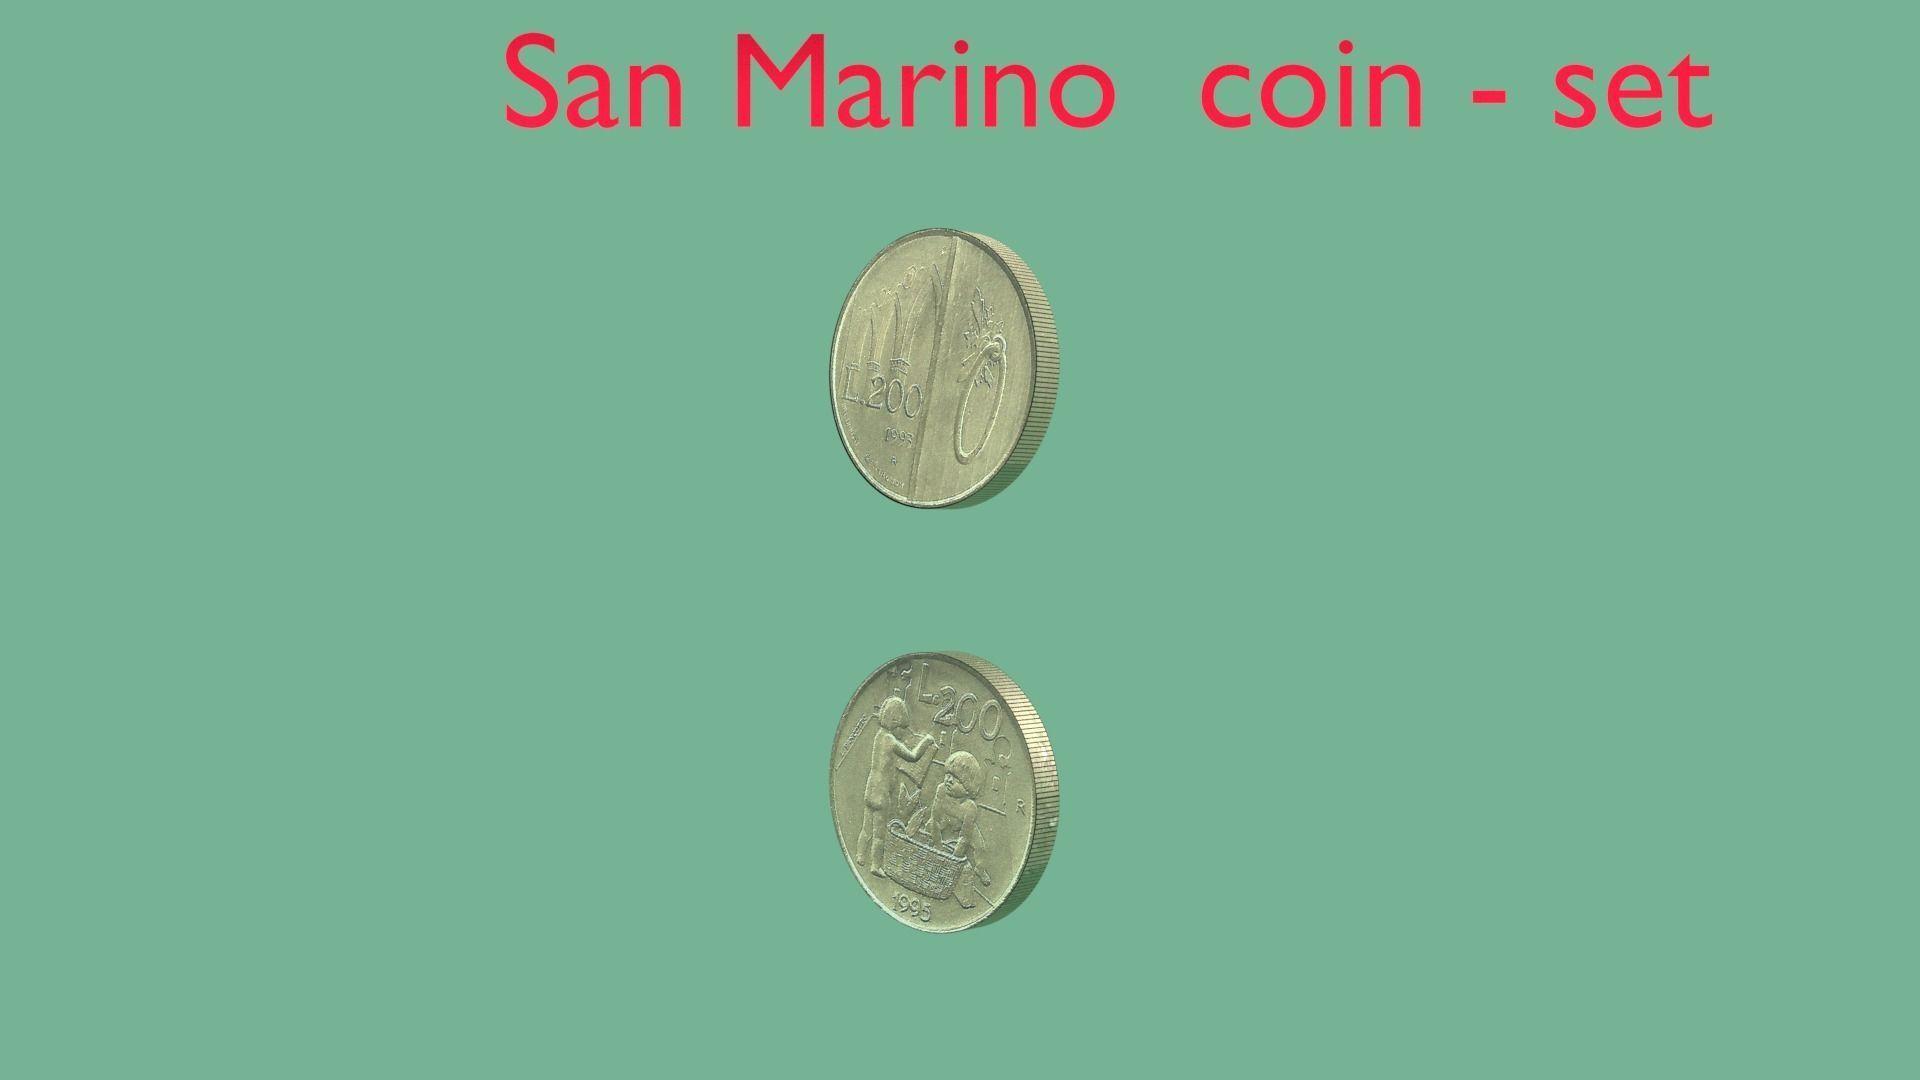 San Marino coin - set model